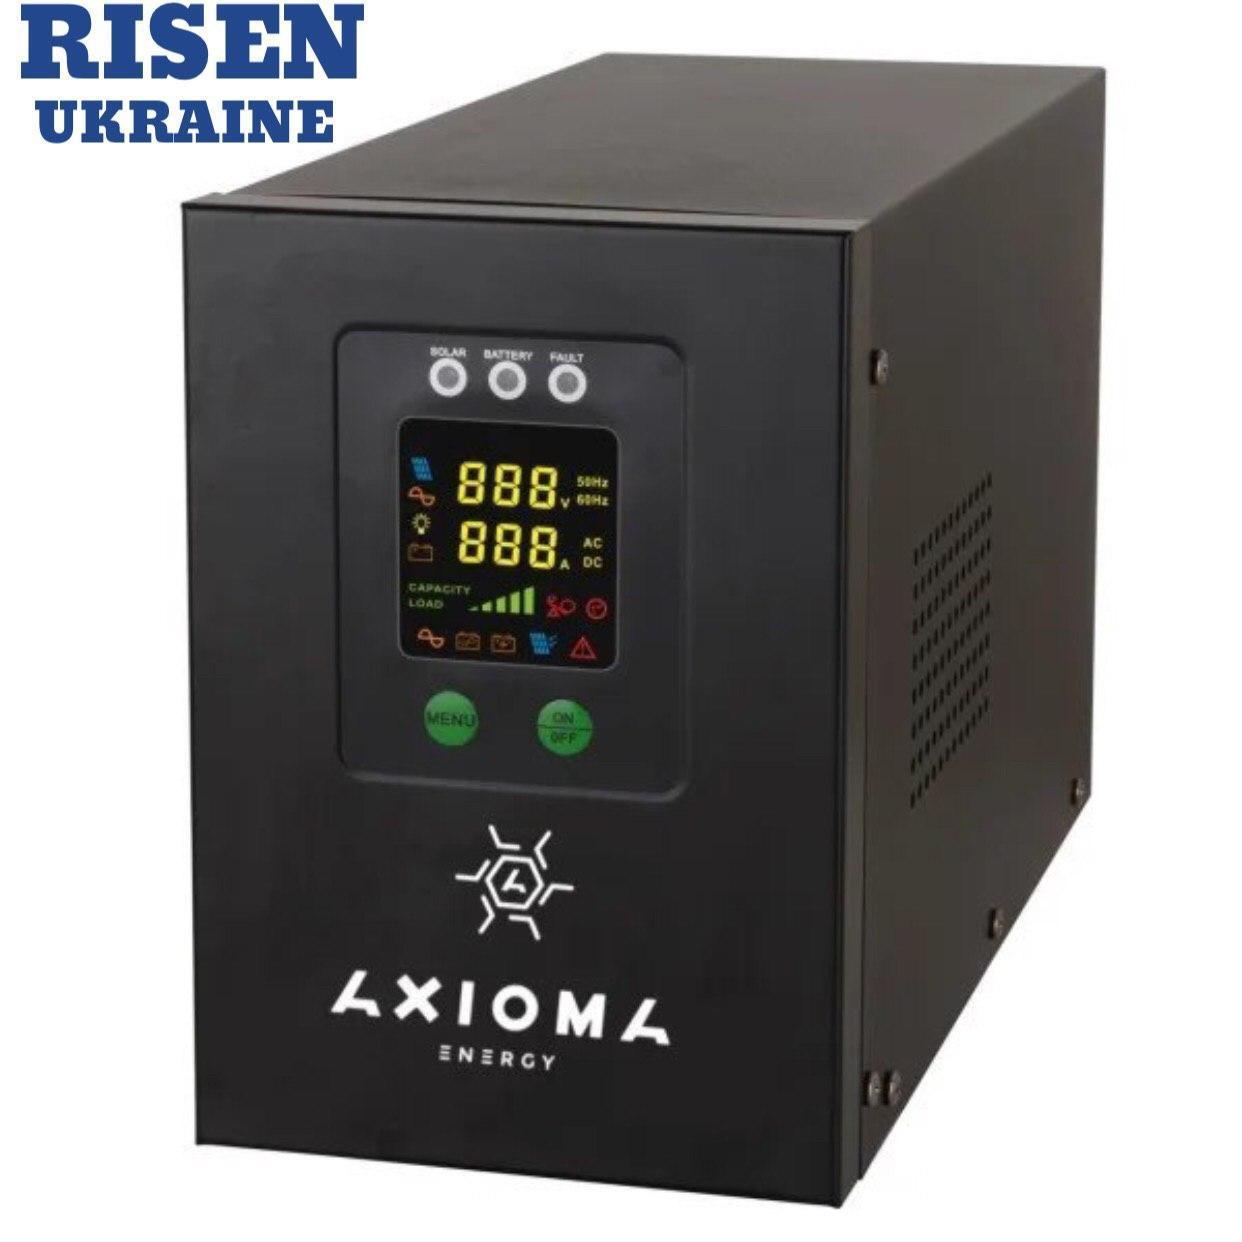 Гибридный ИБП+стабилизатор 800ВА 500Вт 12В + MPPT контроллер 20А 12В, AXEN.IS-800 AXIOMA energy